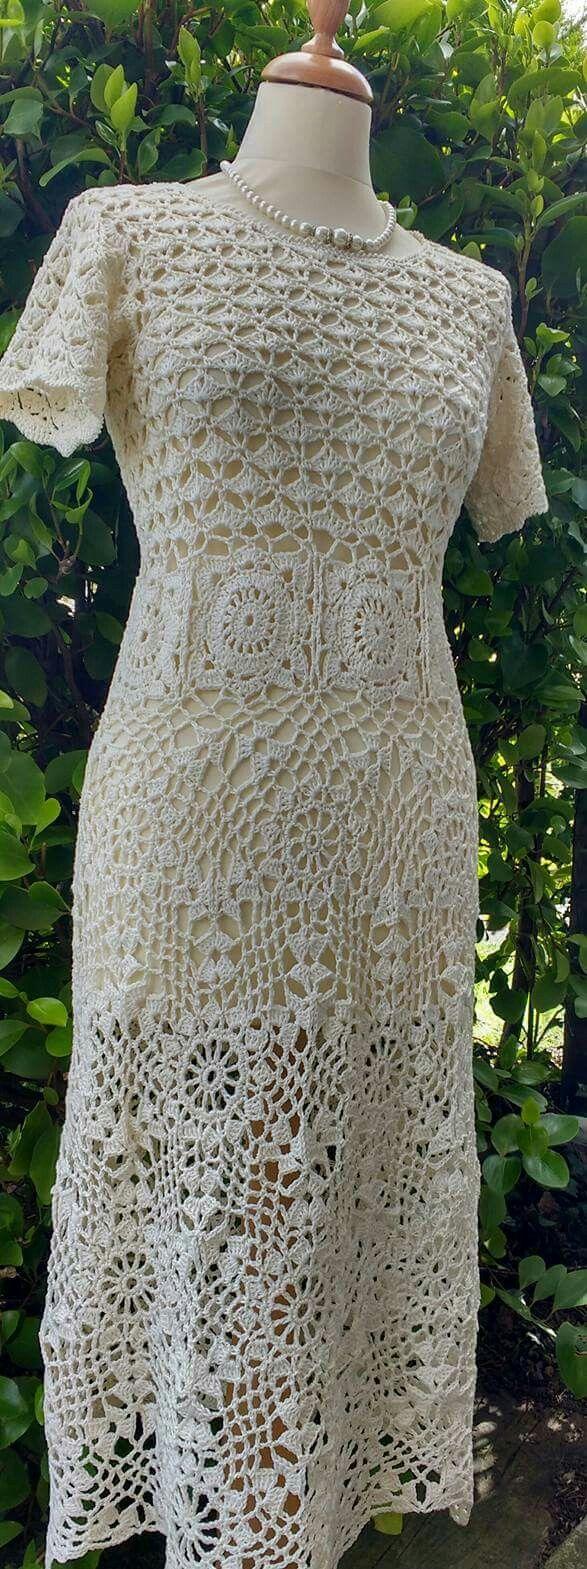 Crochet dress www.facebook.com/designsbysonya